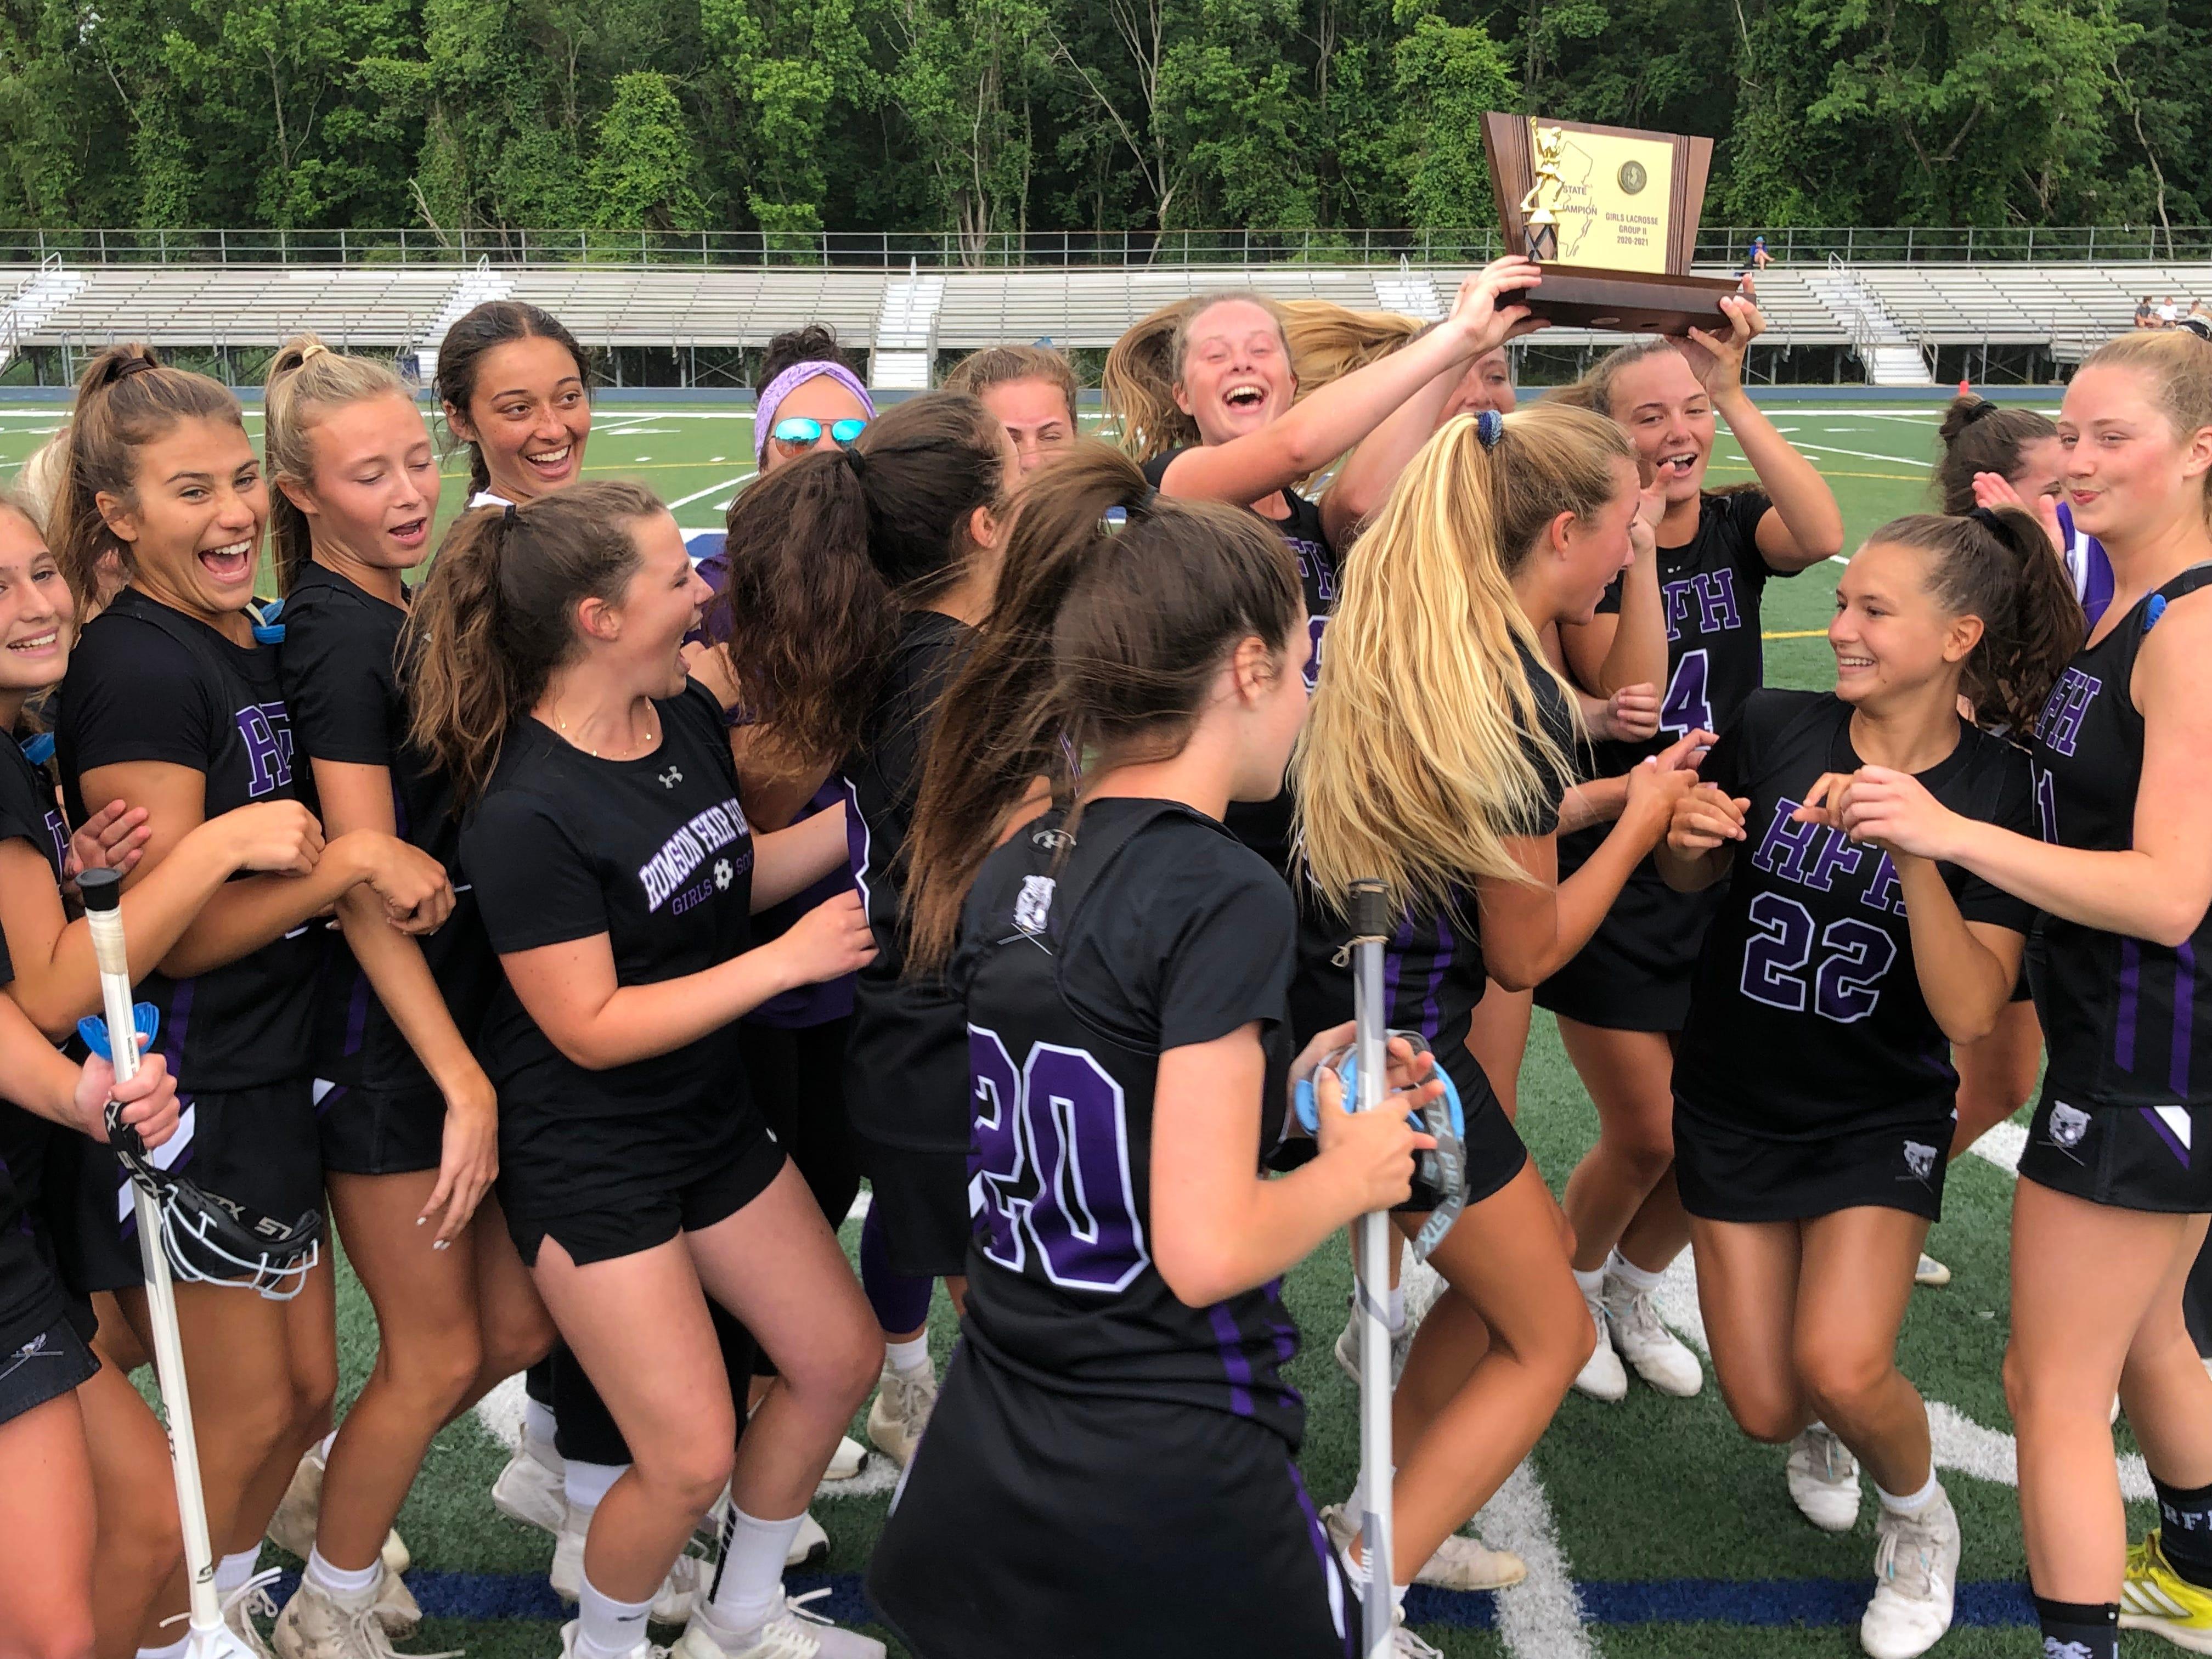 Video: Highlights of Rumson girls lacrosse in NJSIAA Group 2 State Final